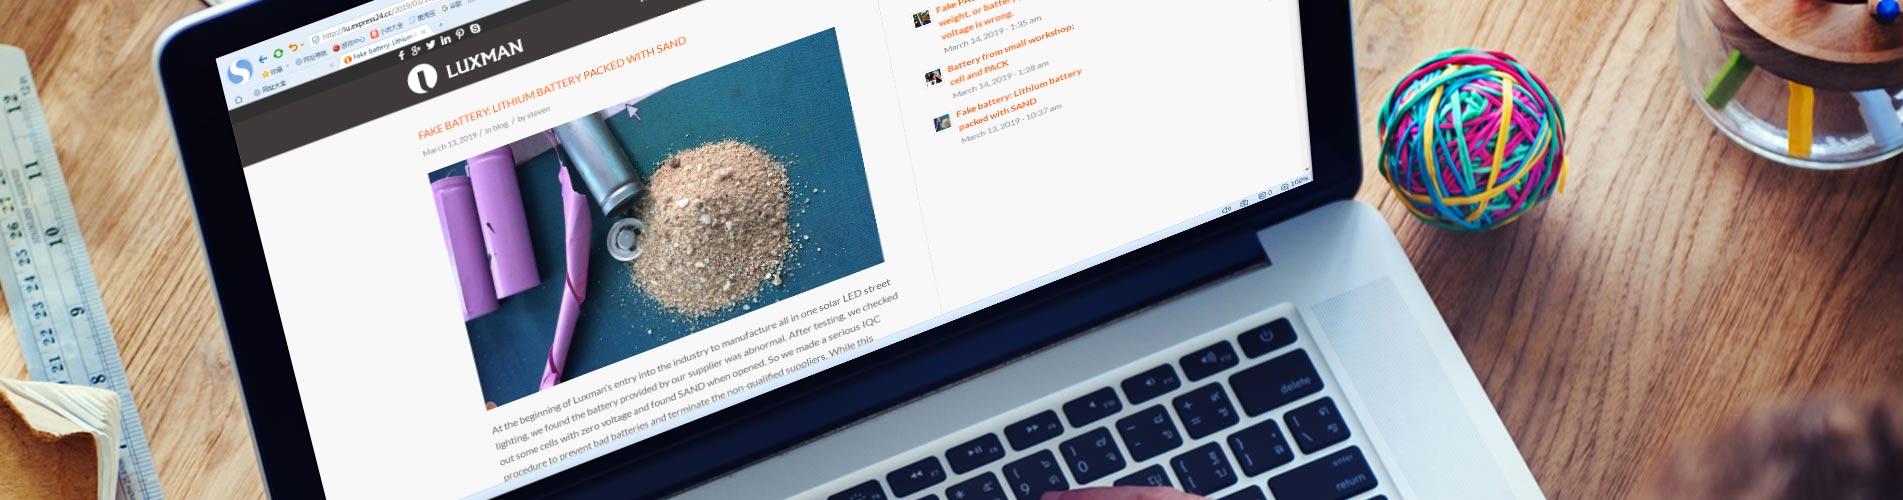 Luxman-light-inner-page-banner-design-Blog